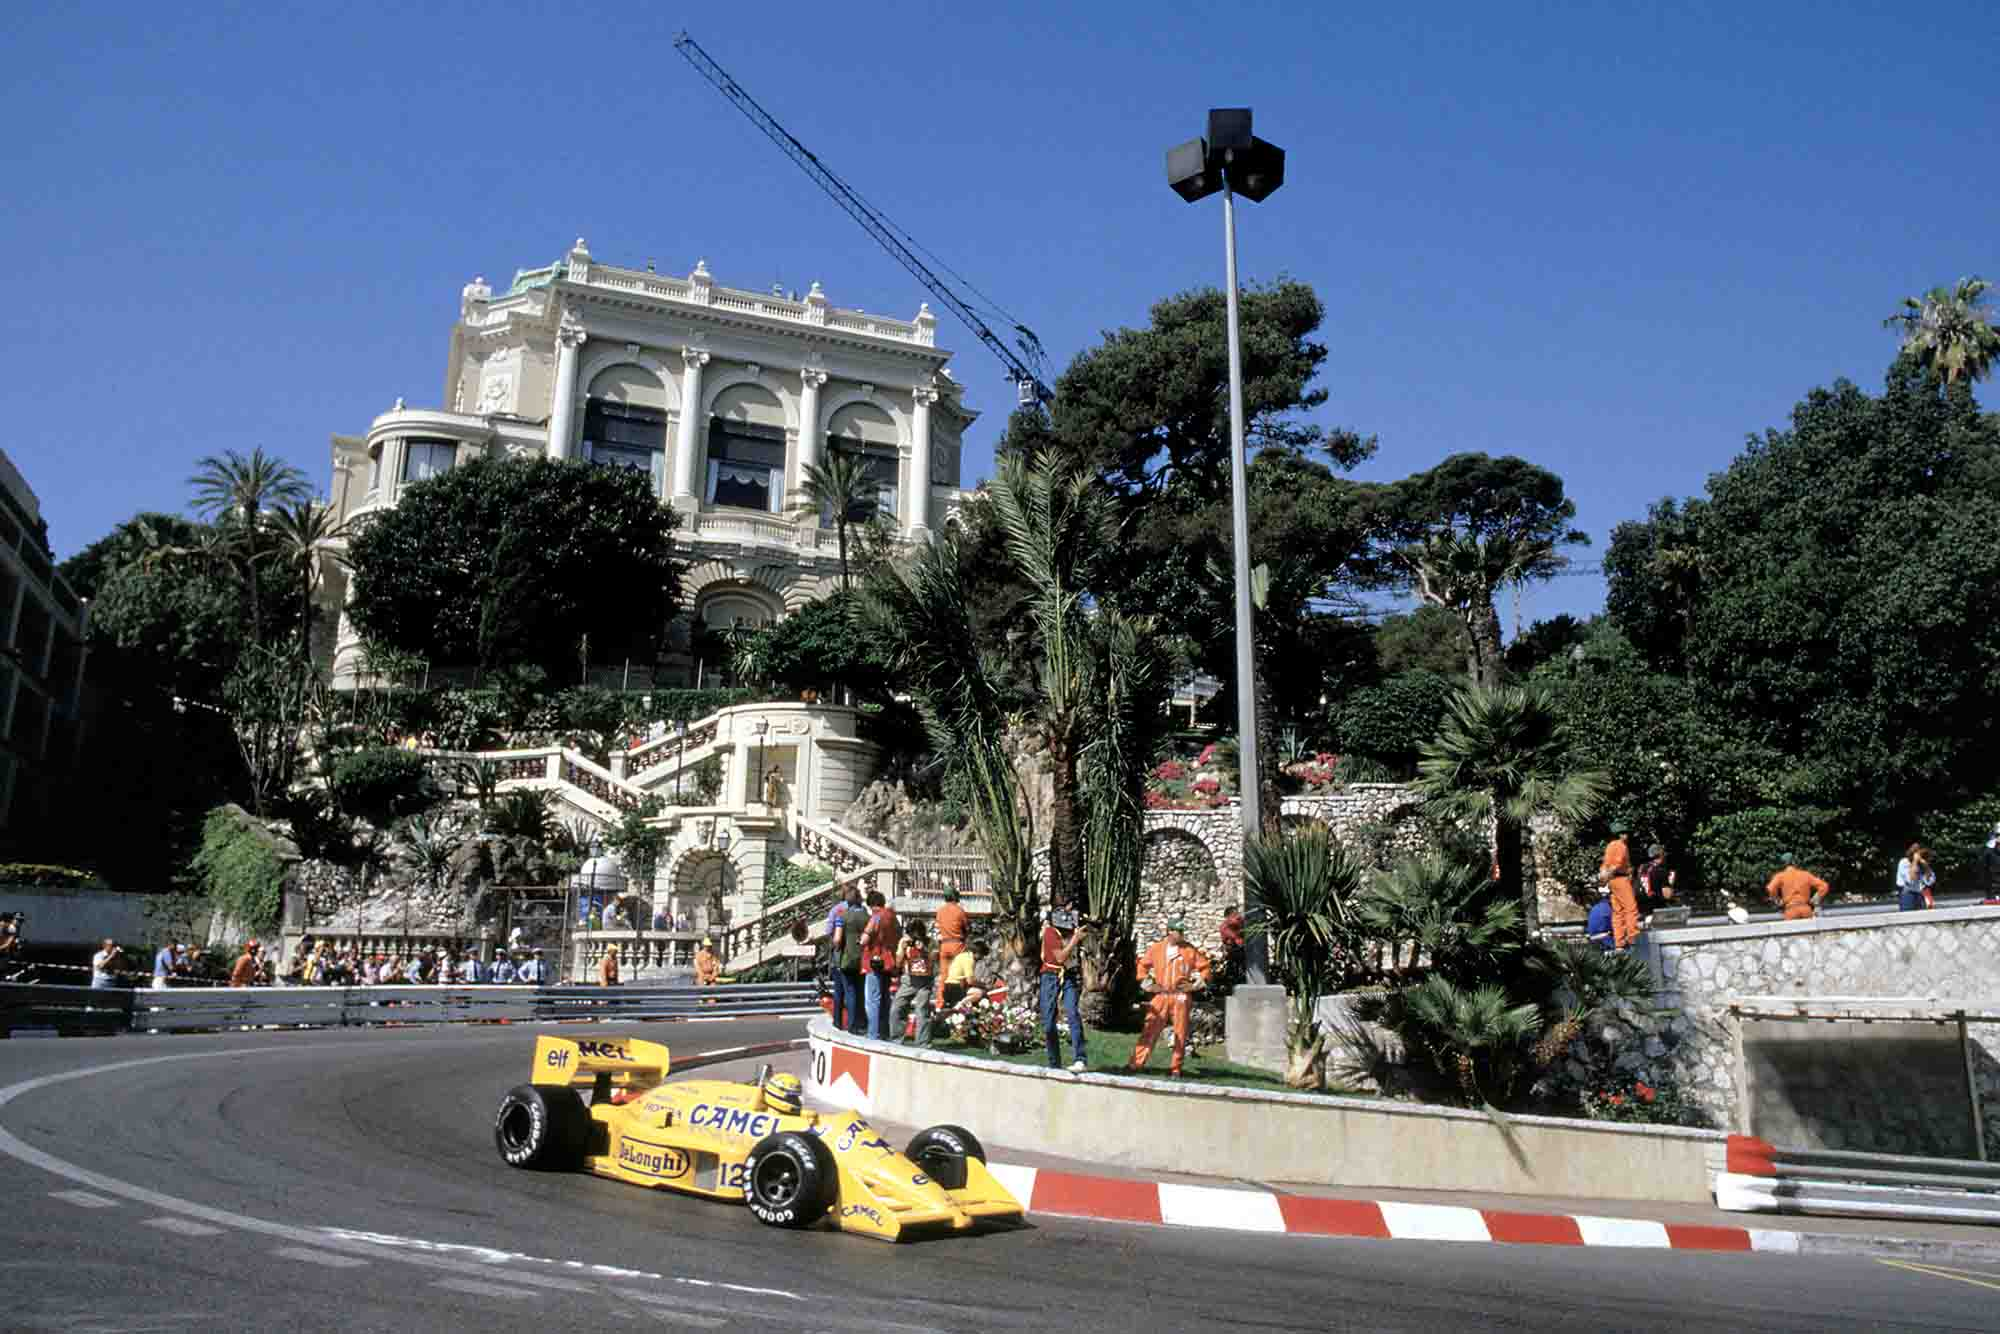 Ayrton Senna rounds the hairpin at Monaco Grand Prix 1987